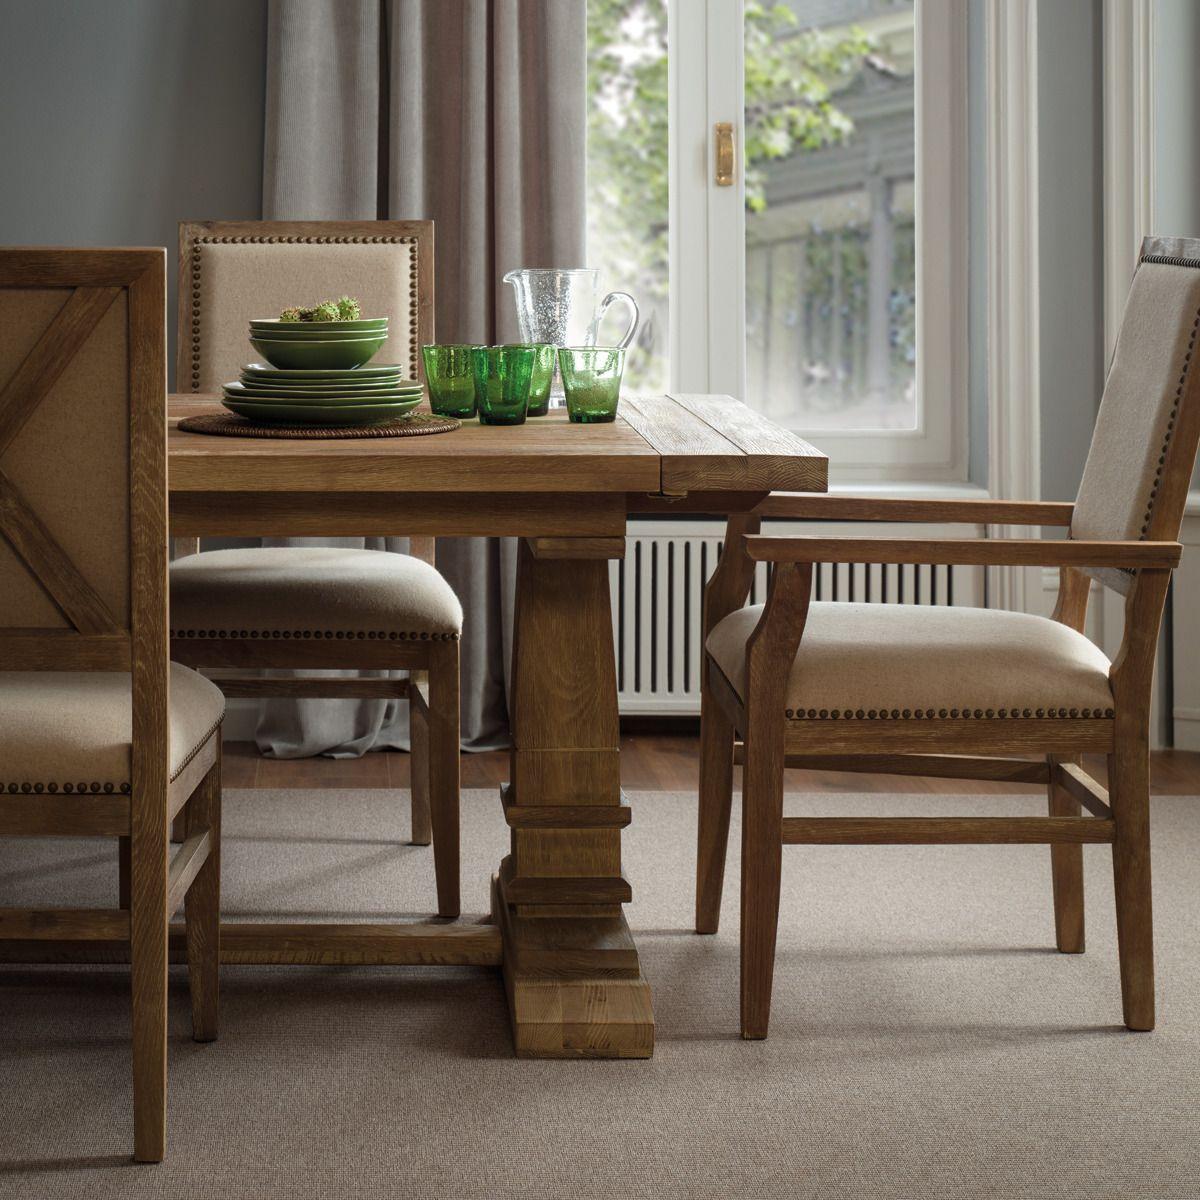 Mesa de comedor extensible de madera Vintage | HOGAR | Pinterest